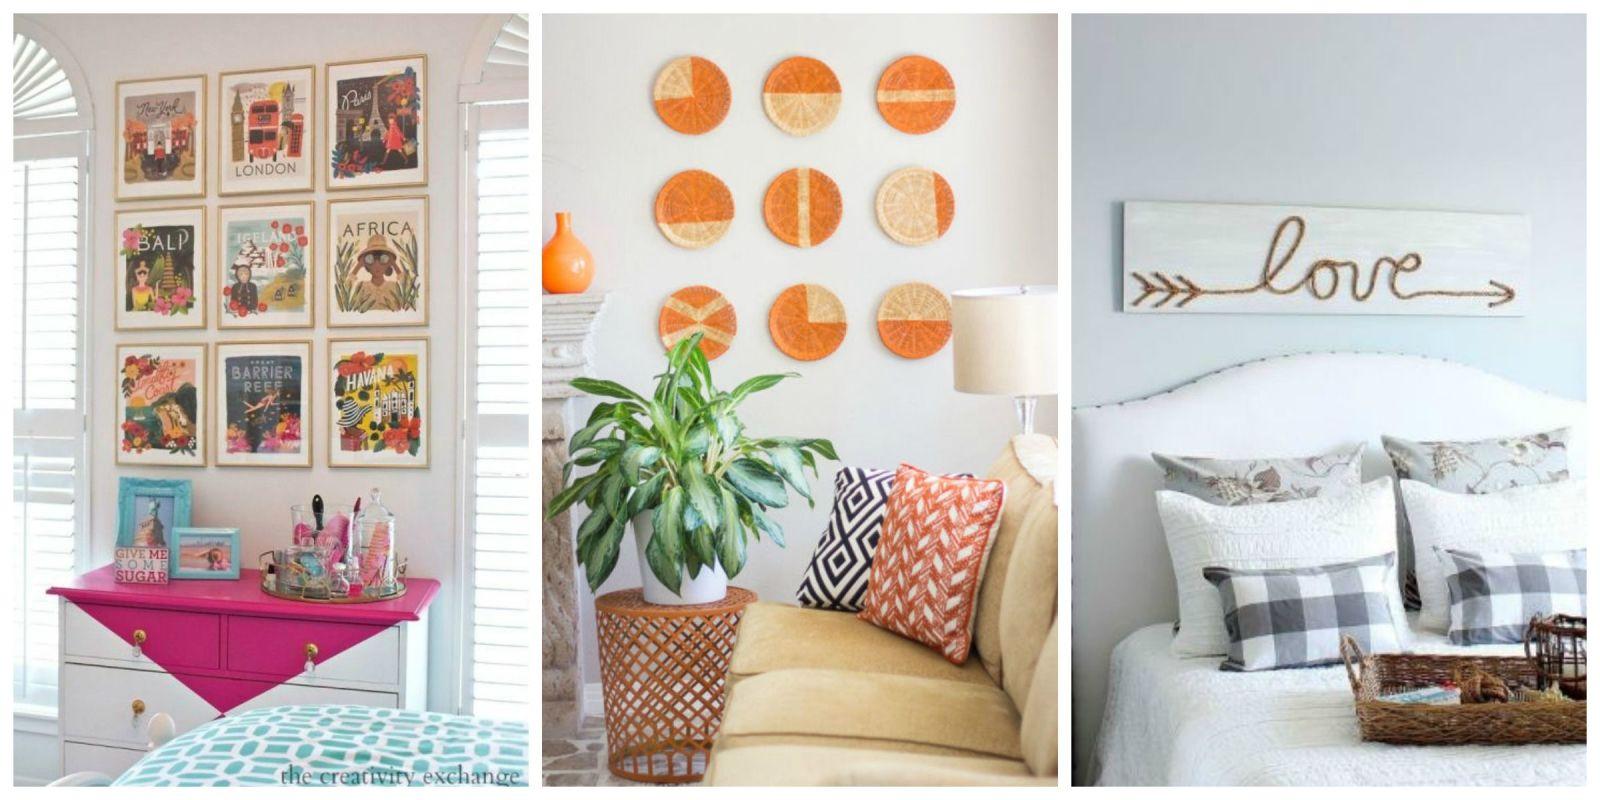 Diy wall art affordable art ideas for Cheap kitchen wall decor ideas